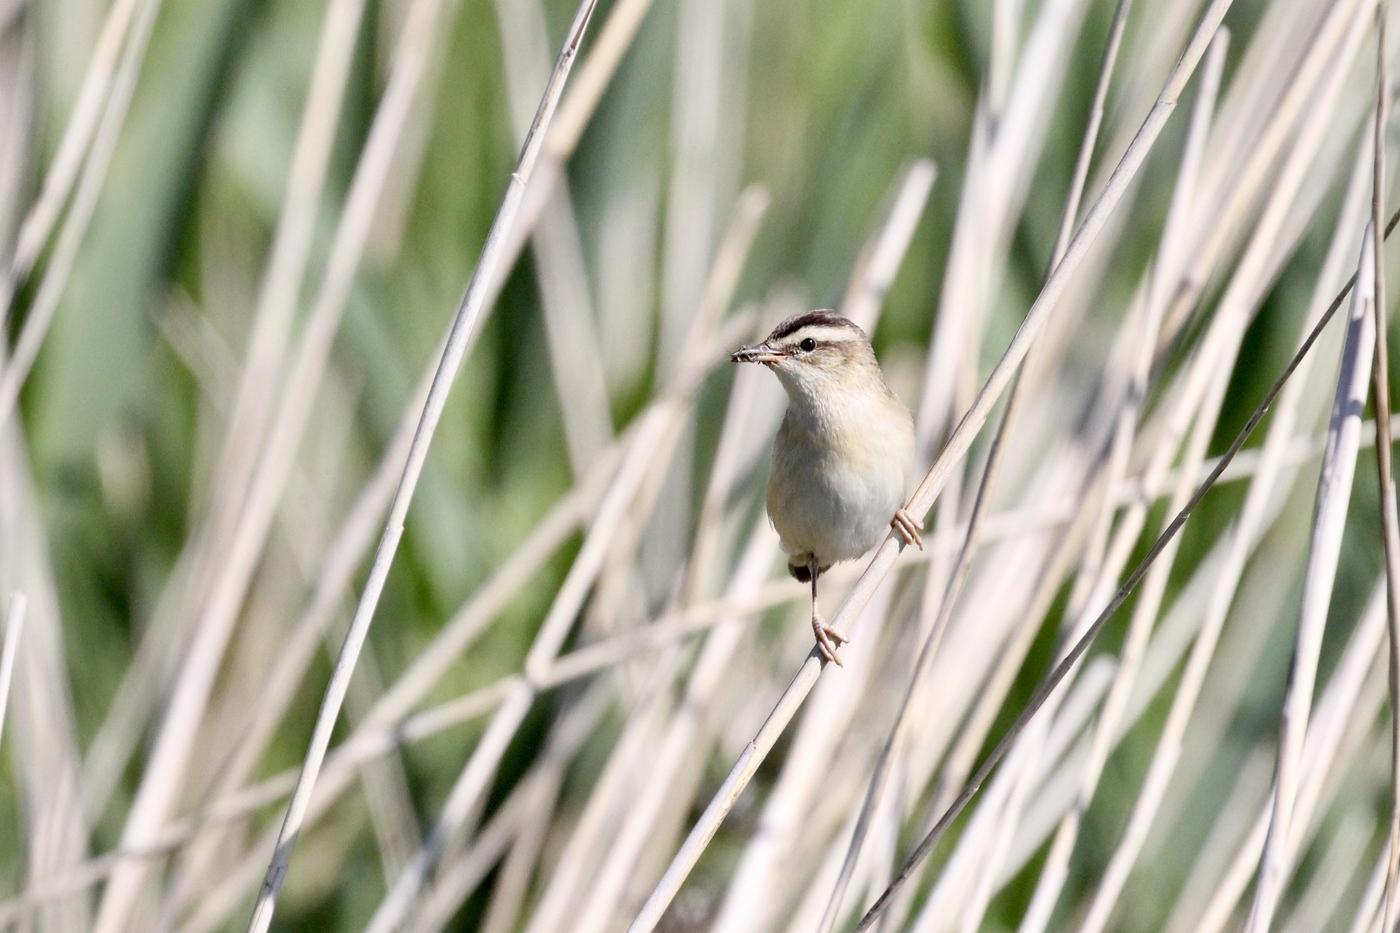 20190529 Birding Nieuwkoopse Plassen